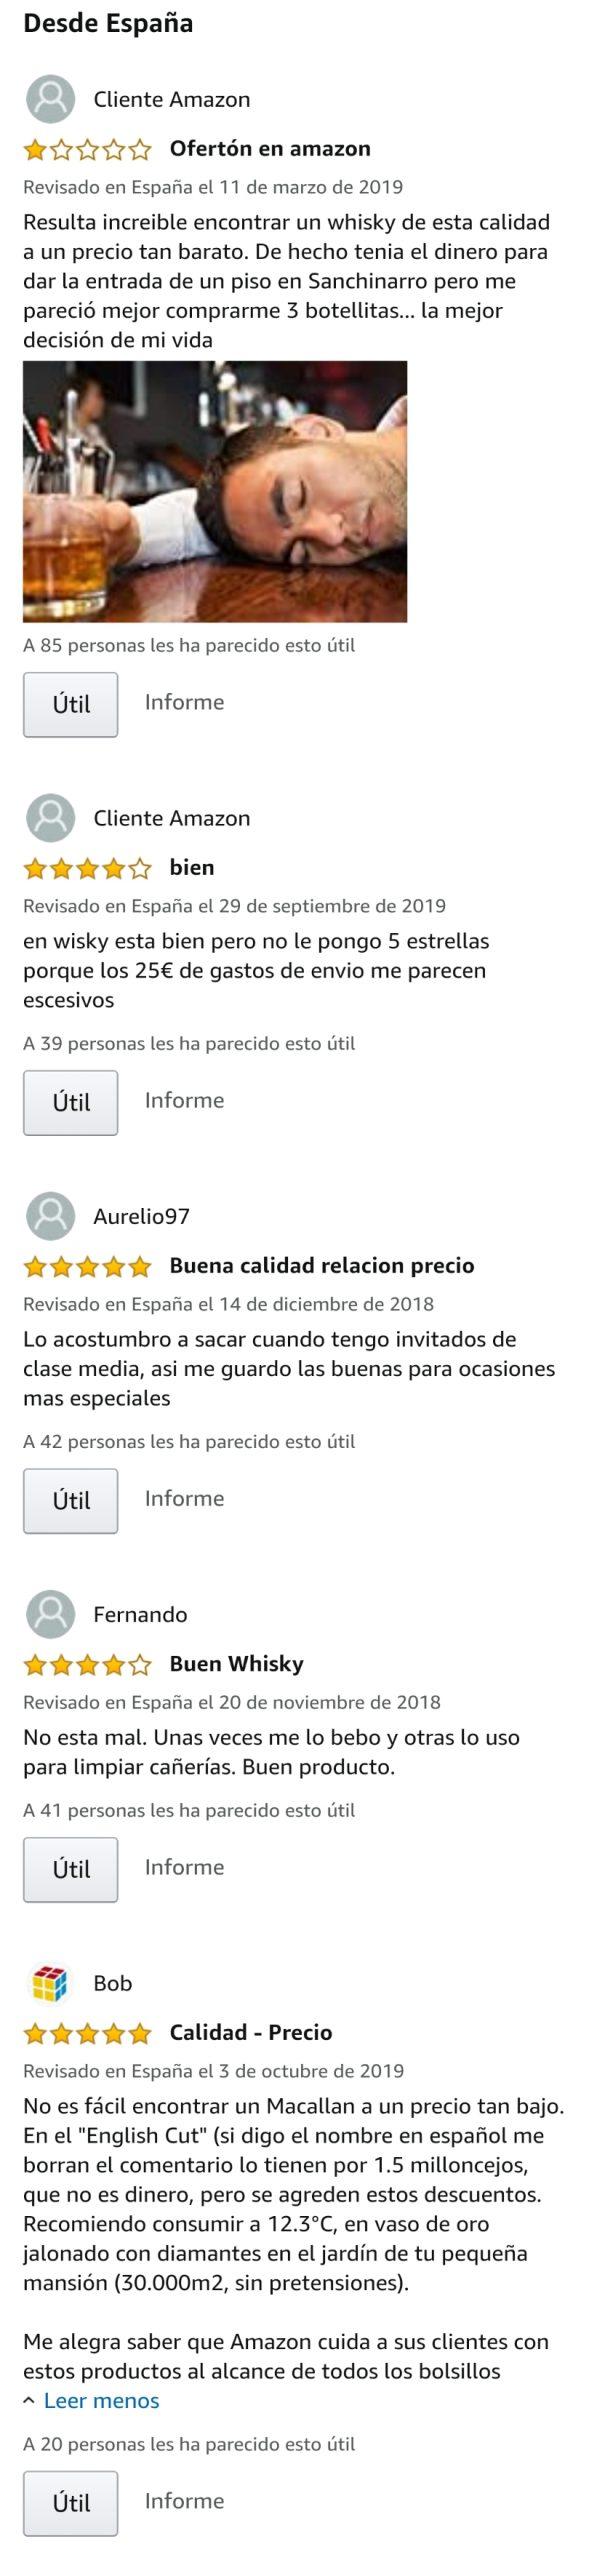 Amazon vende una botella de Macallan por 46.351,31 euros